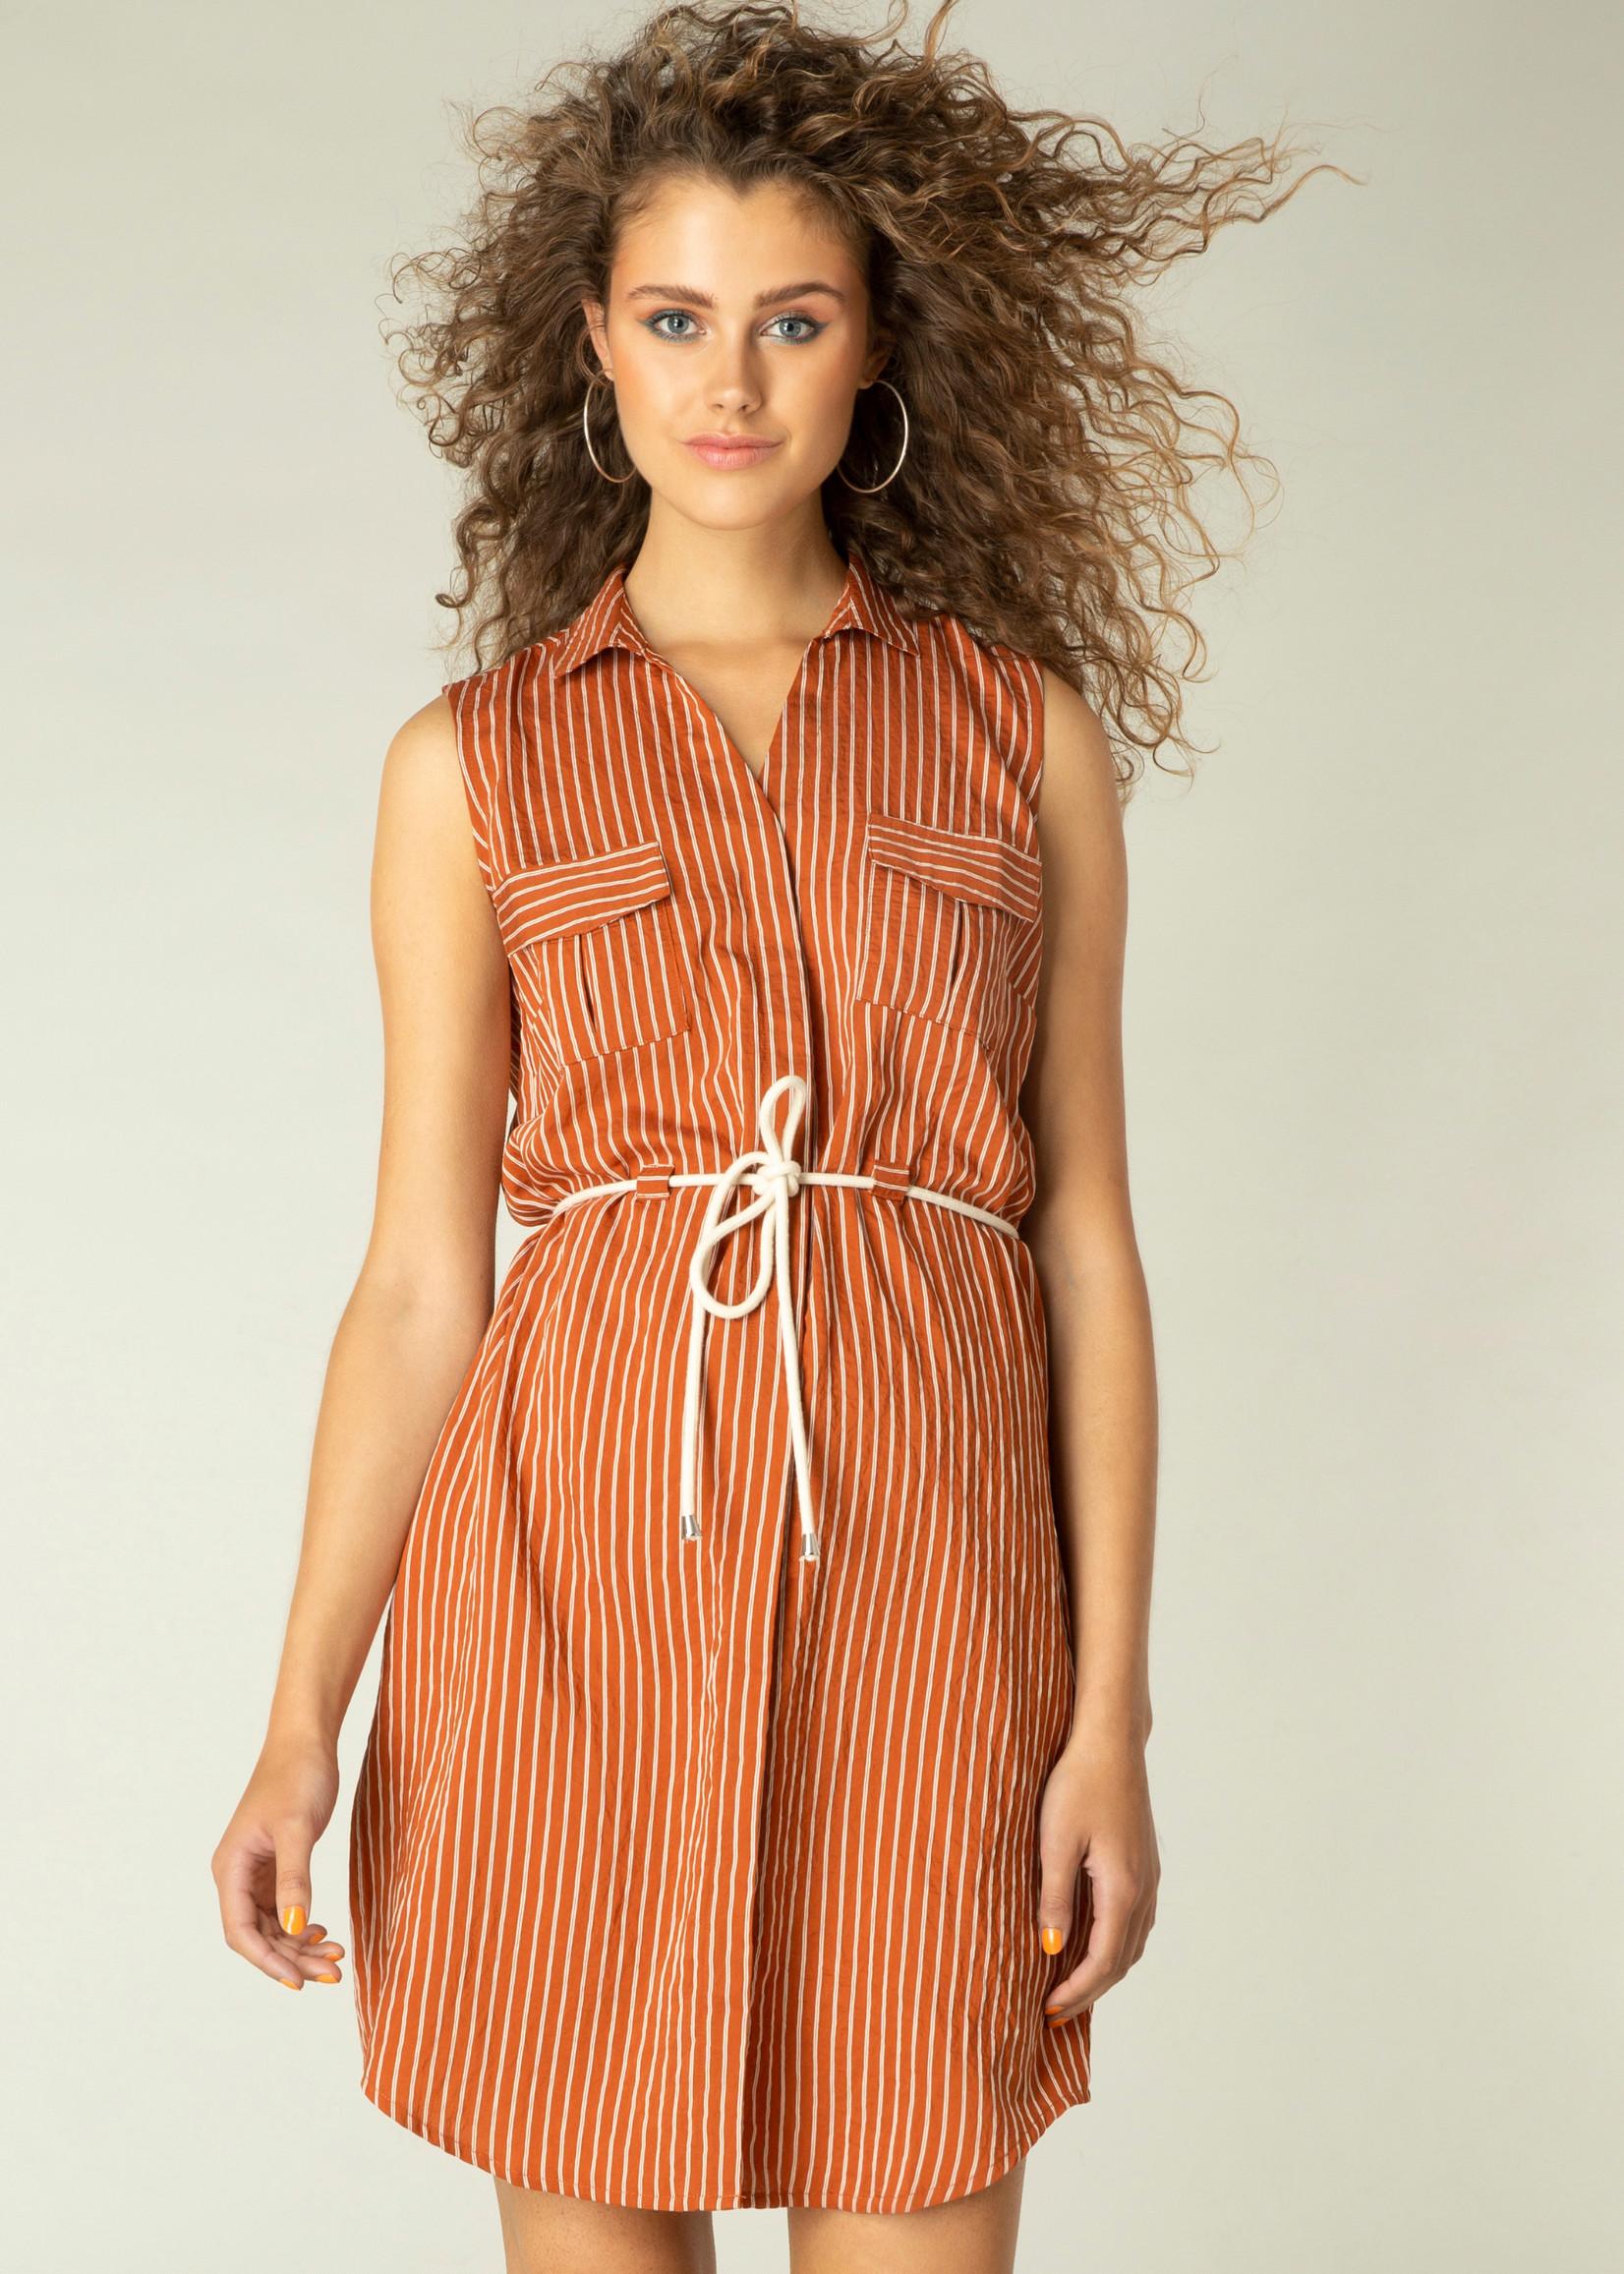 Yest Yest Kayna Dress